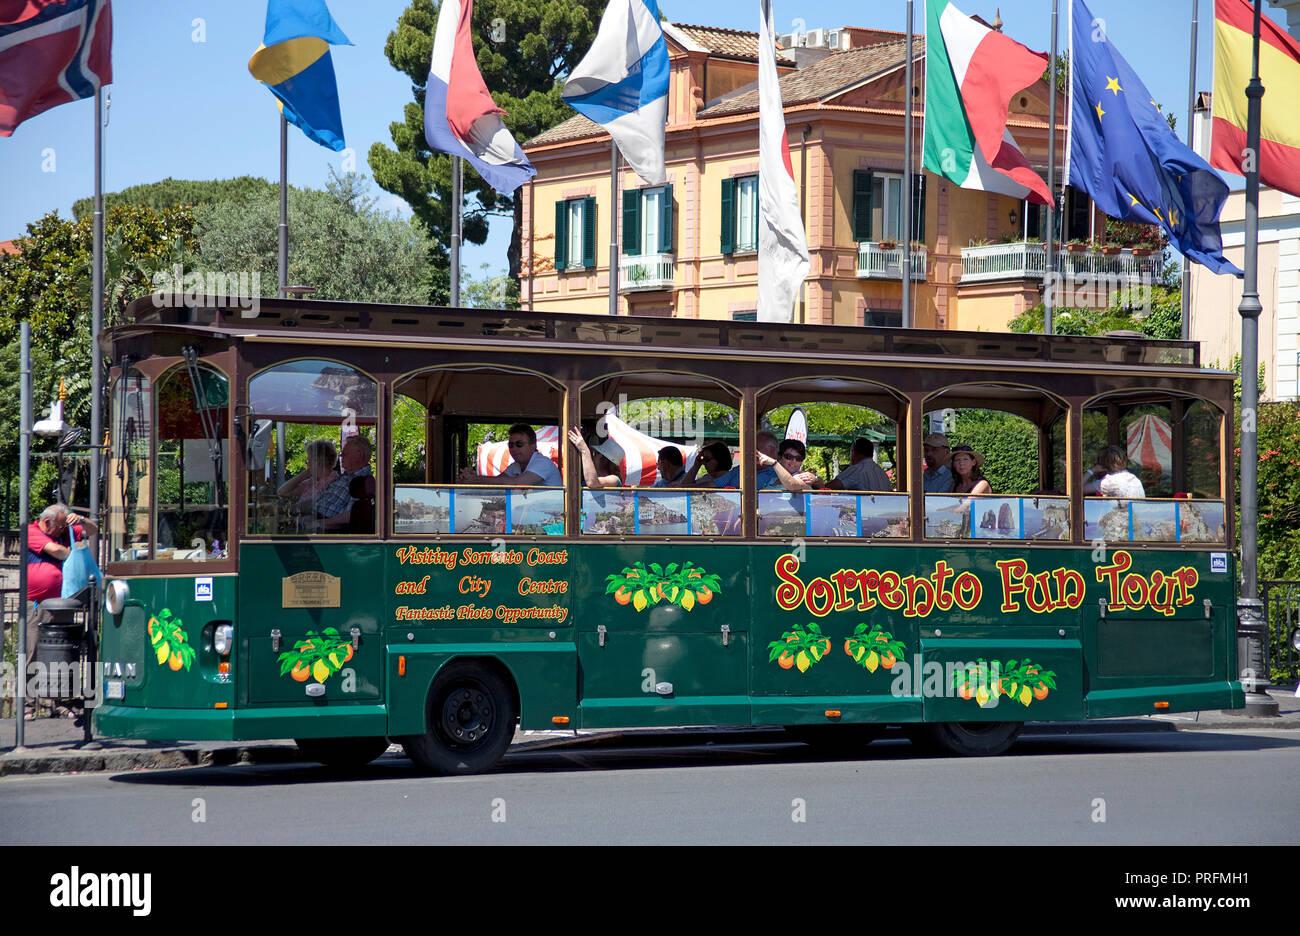 Retro bus touristique à Piazza Tasso, Sorrento, Péninsule de Sorrente, Golfe de Naples, Campanie, Italie Photo Stock